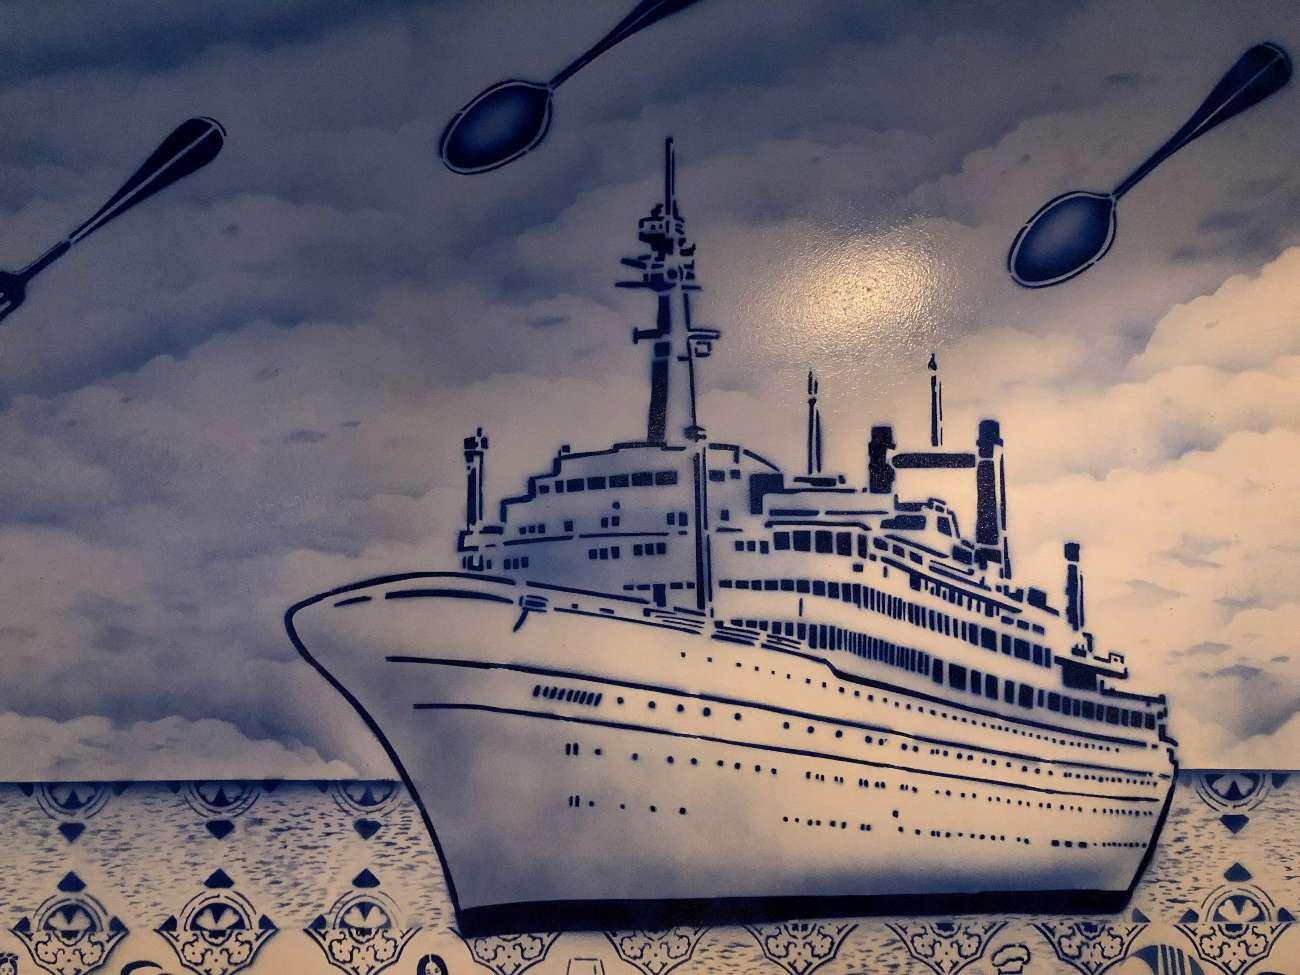 Gemälde eines Ozeanriesens im Lokal de Matroos en het Meisje in Rotterdam